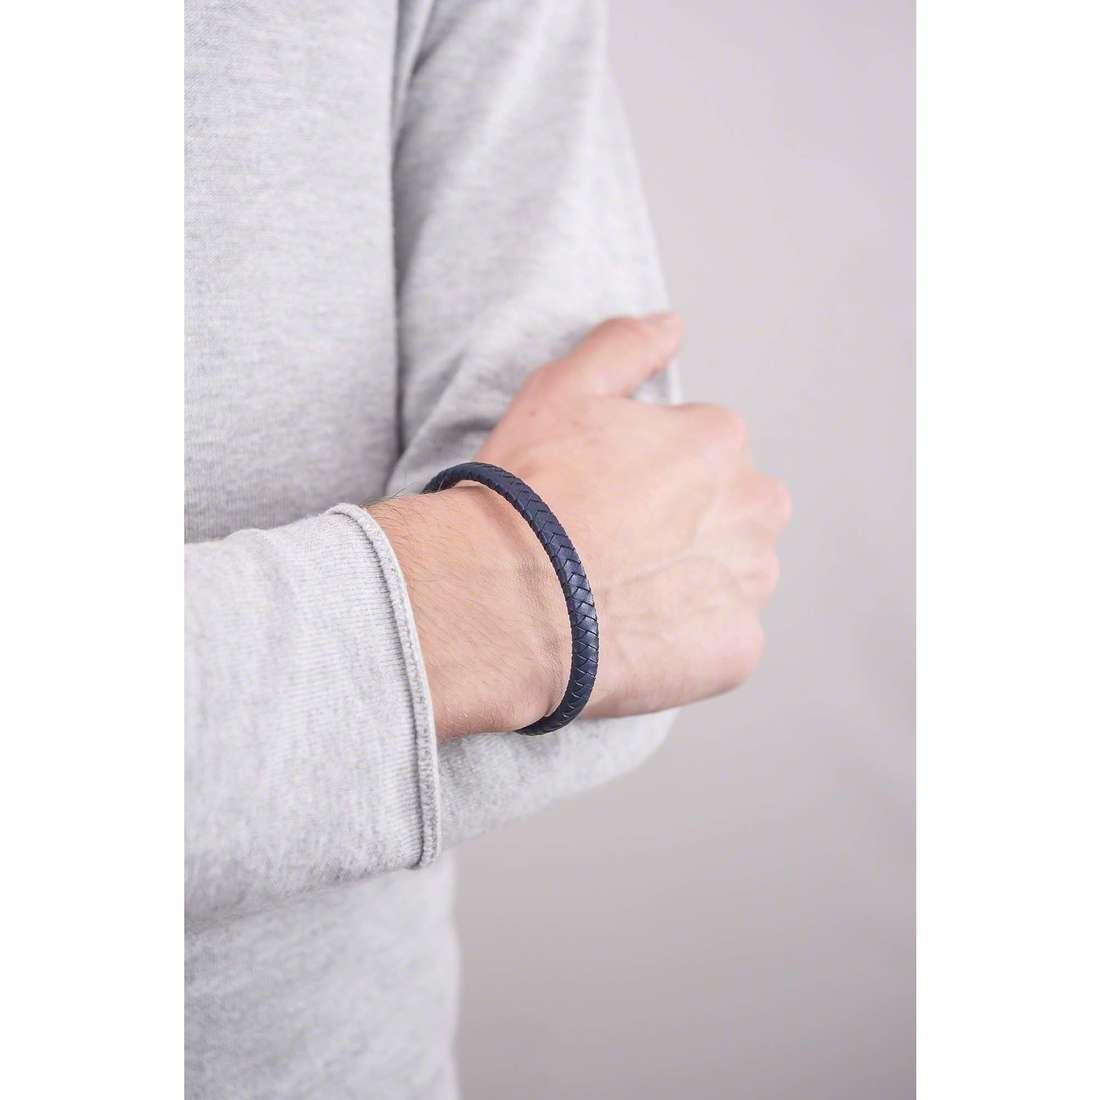 4US Cesare Paciotti bracelets Steel homme 4UBR1308 indosso